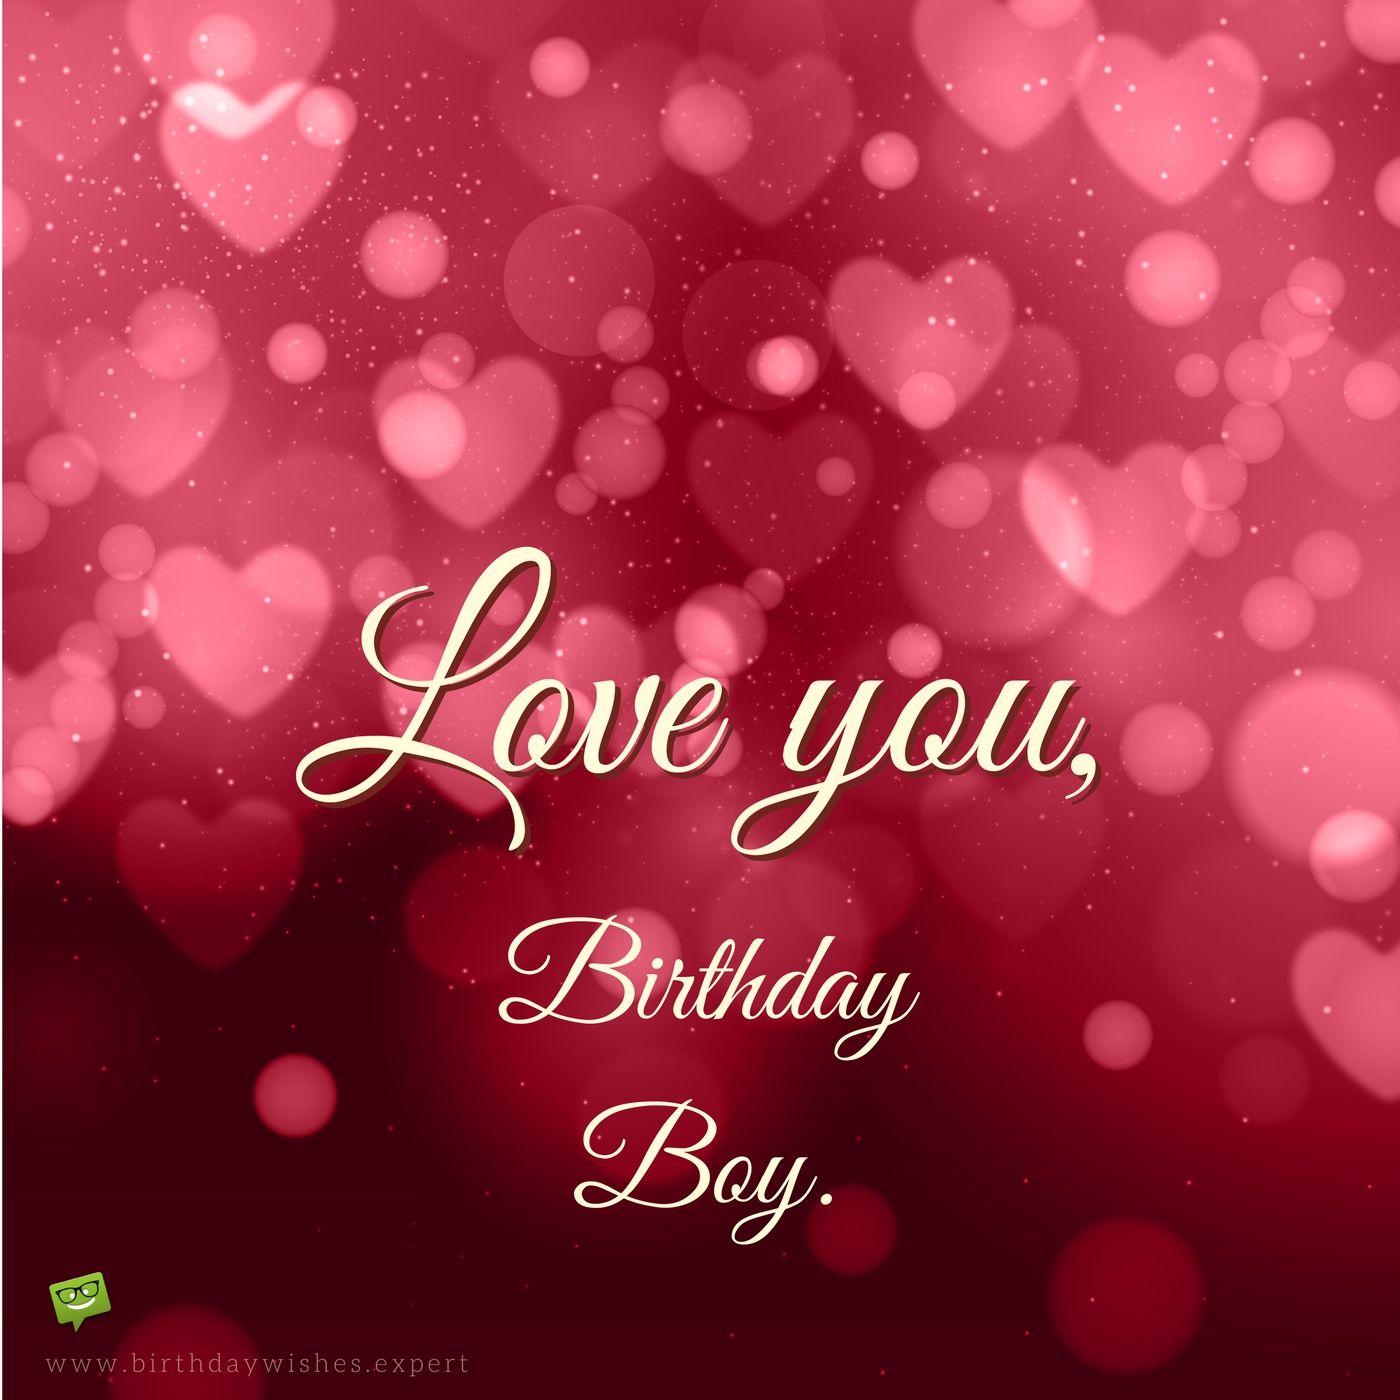 Smart happy birthday wishes for your boyfriend warm wishes i love you birthday boy m4hsunfo